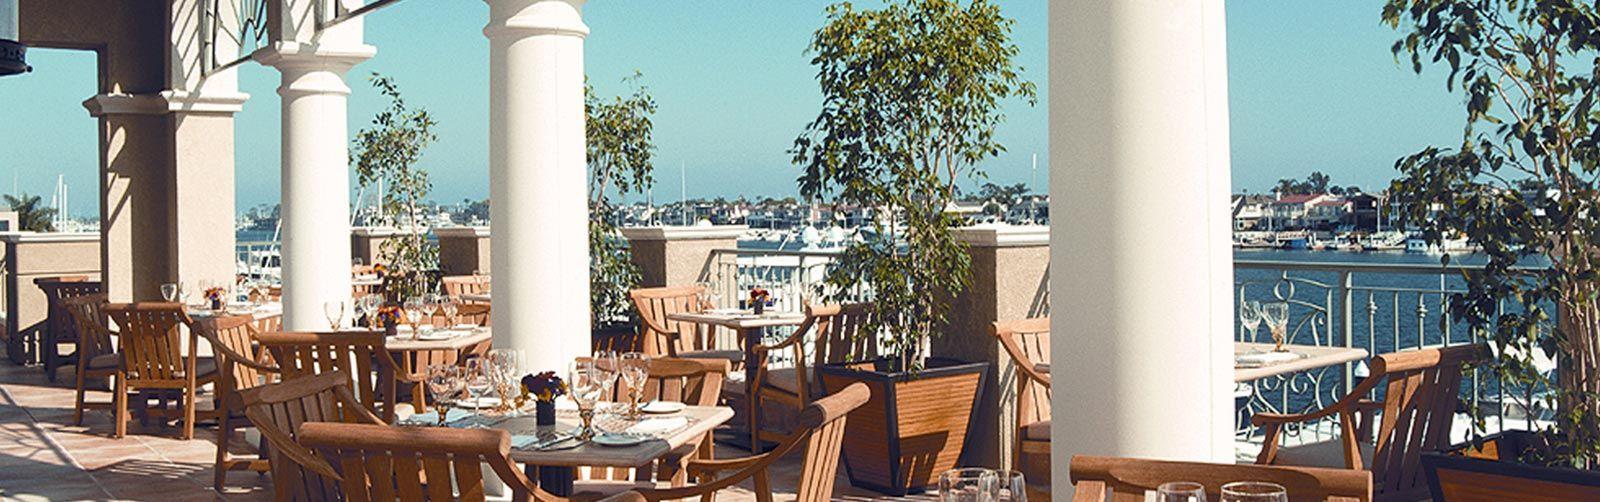 Restaurants In Orange County Ca | Orange County Restaurant With Private  Dining | Balboa Bay Resort